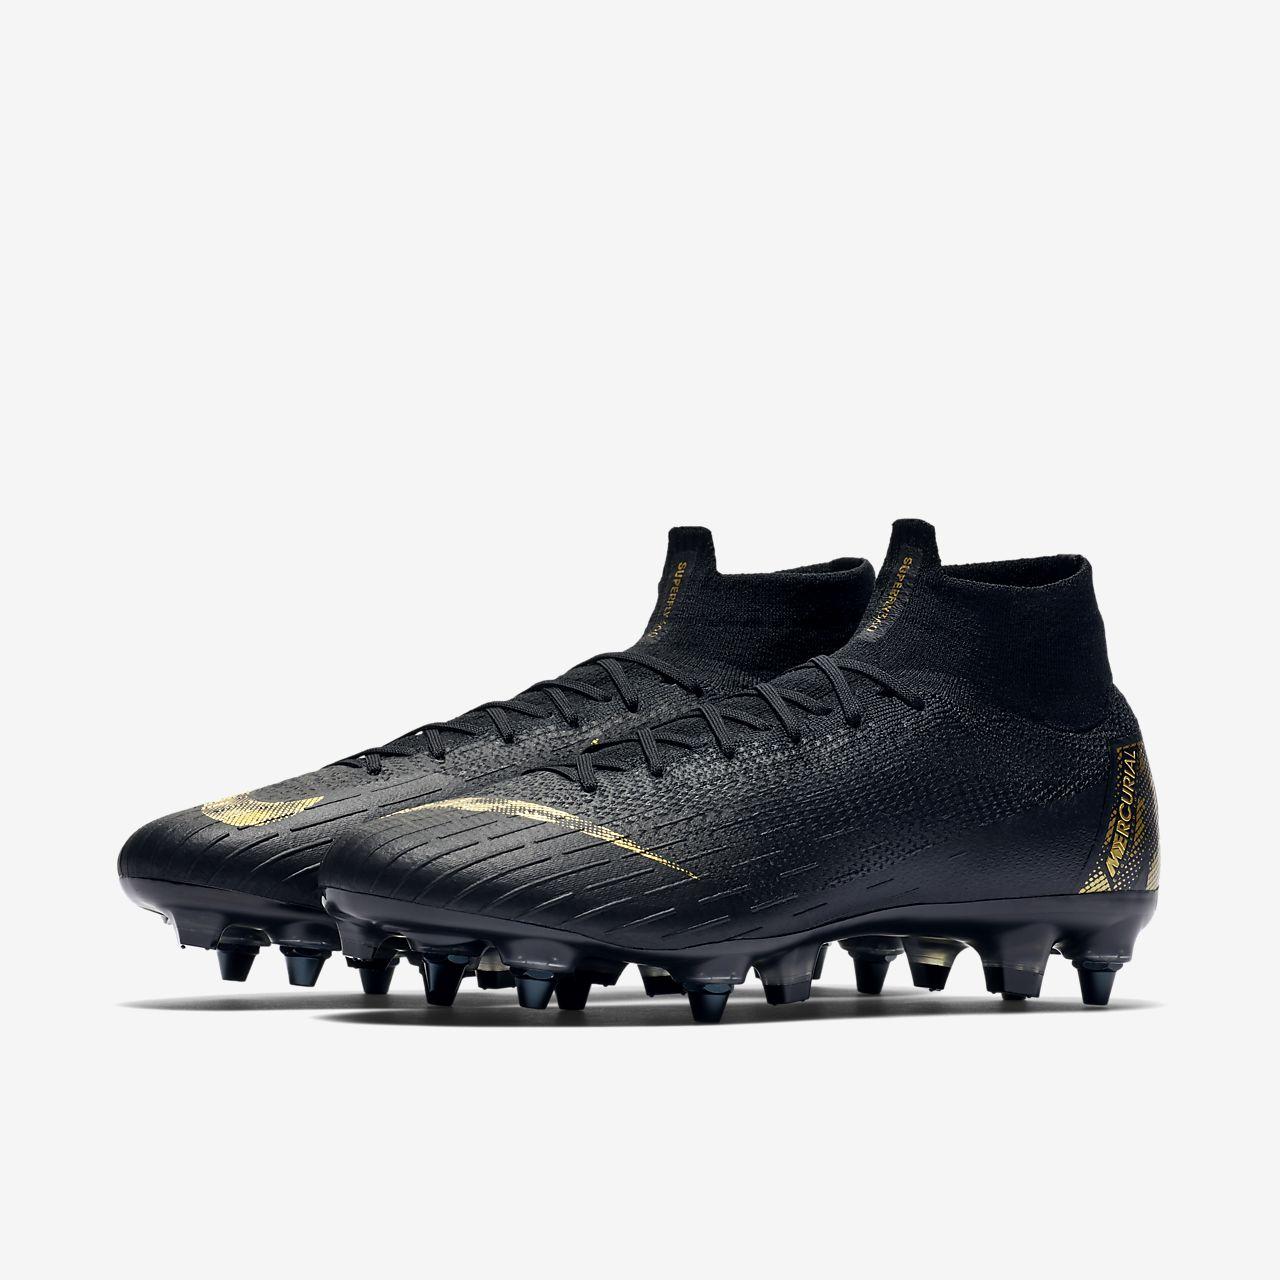 low priced 55b31 f35b8 ... Korki piłkarskie na miękką murawę Nike Mercurial Superfly 360 Elite SG-PRO  Anti-Clog